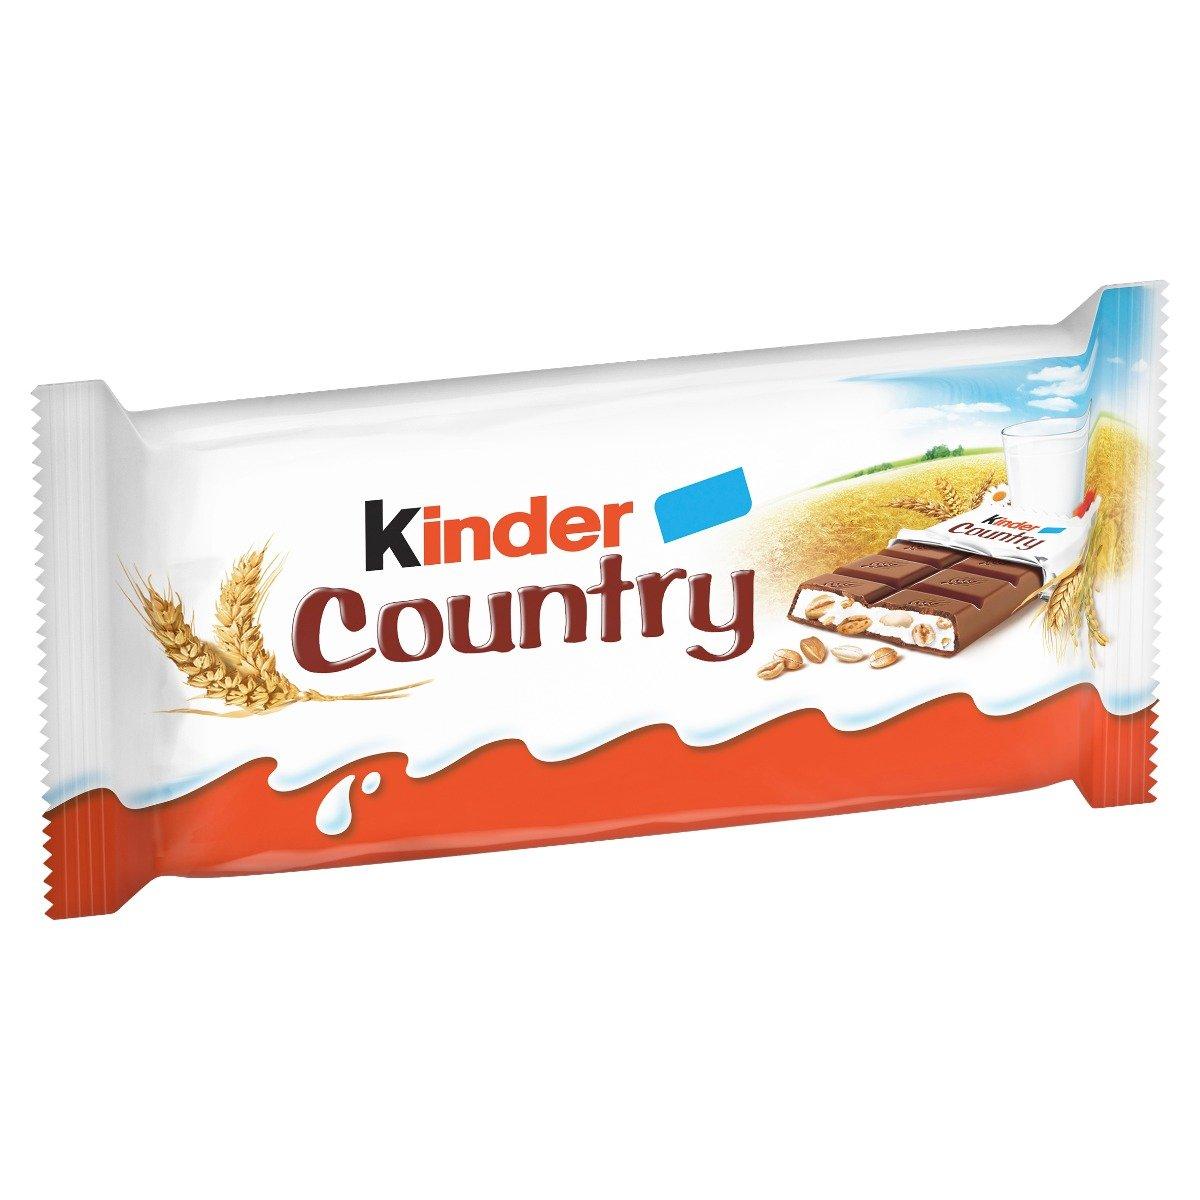 Batoane de ciocolata Kinder Country, 4 buc x 24 g imagine